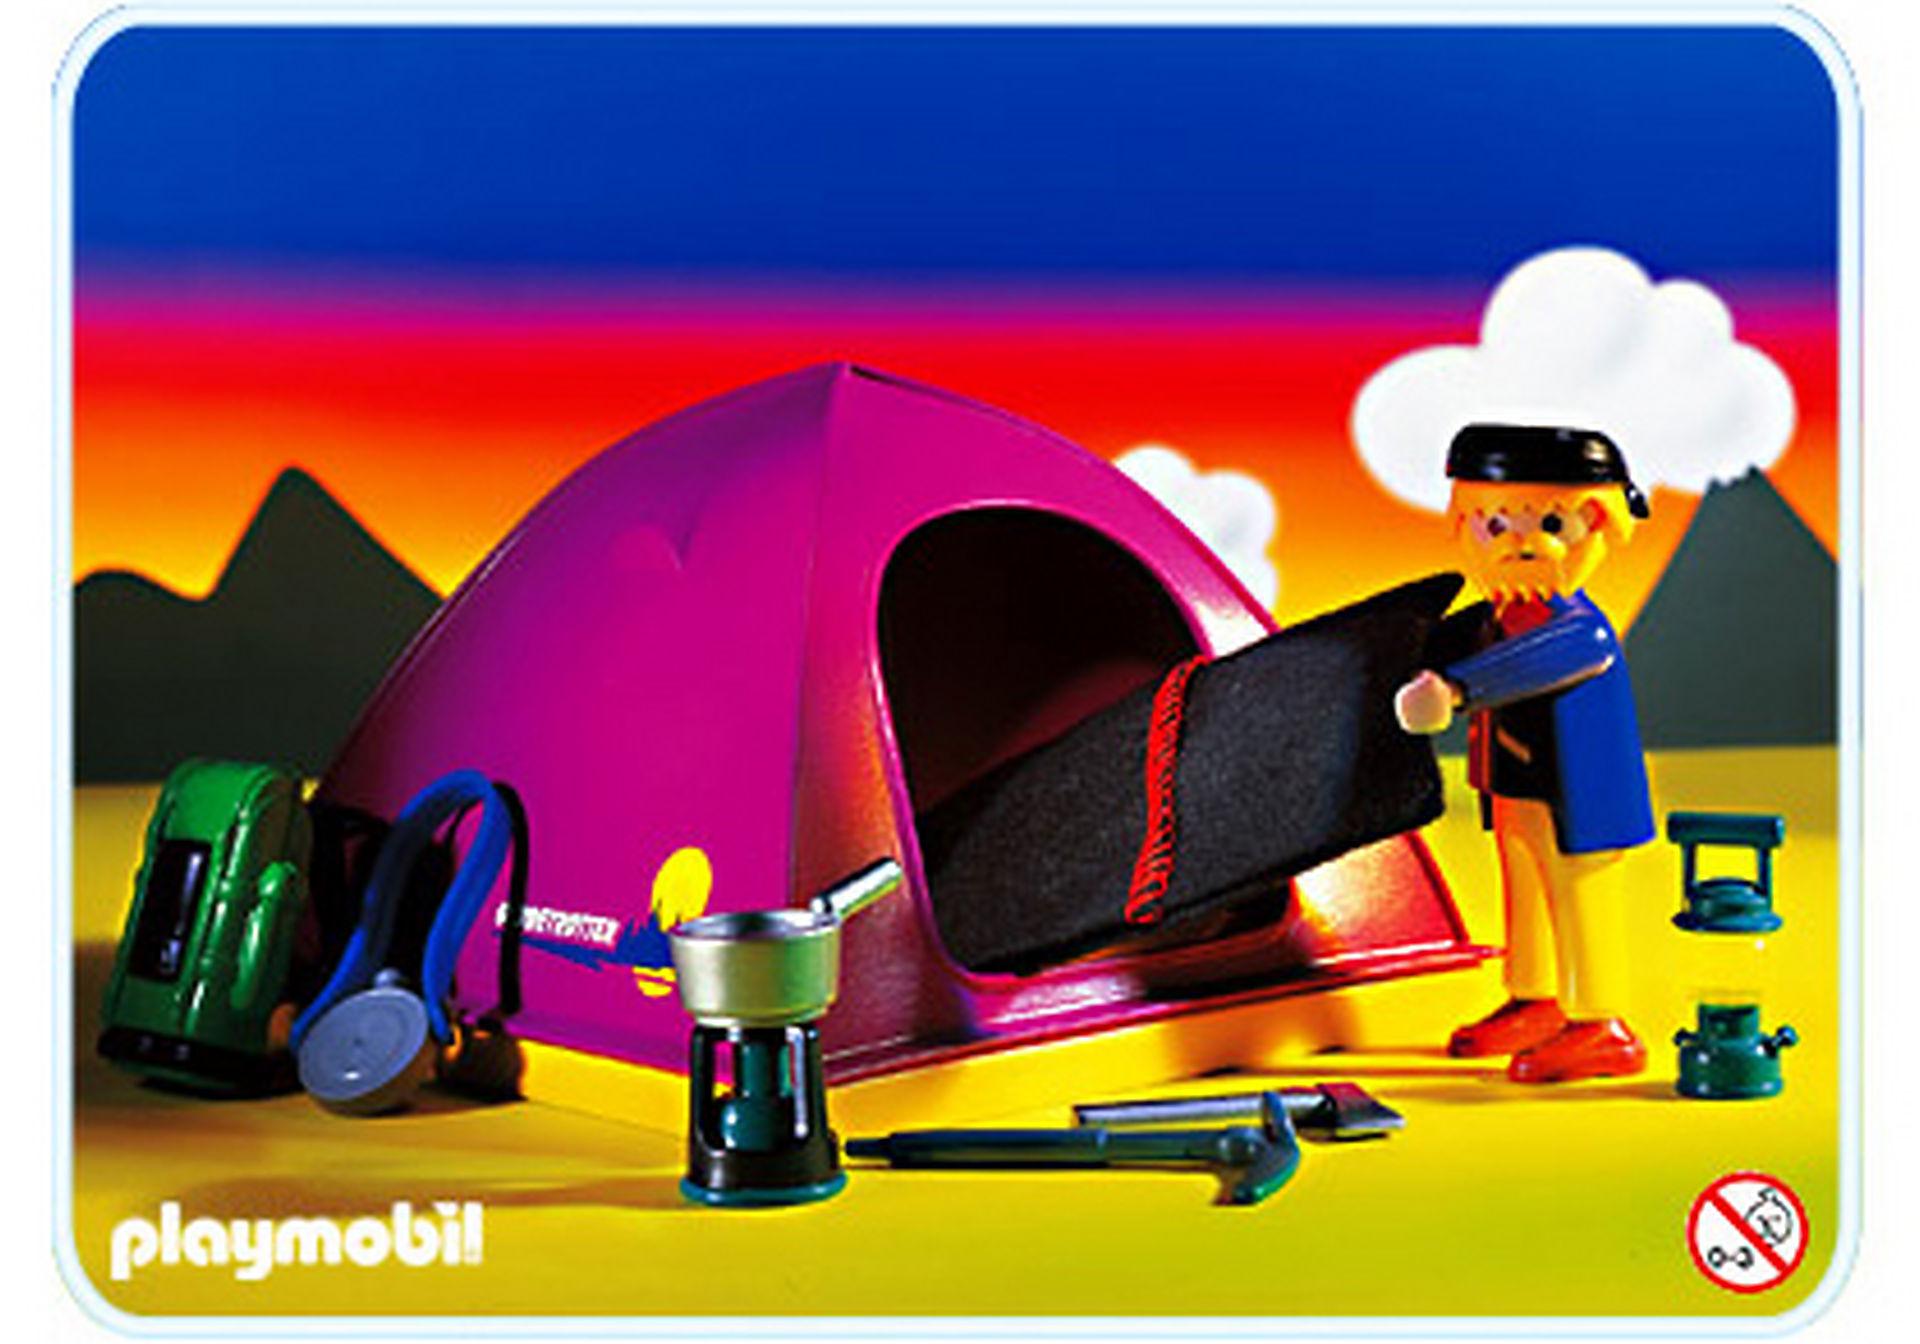 http://media.playmobil.com/i/playmobil/3844-A_product_detail/Randonneur / tente